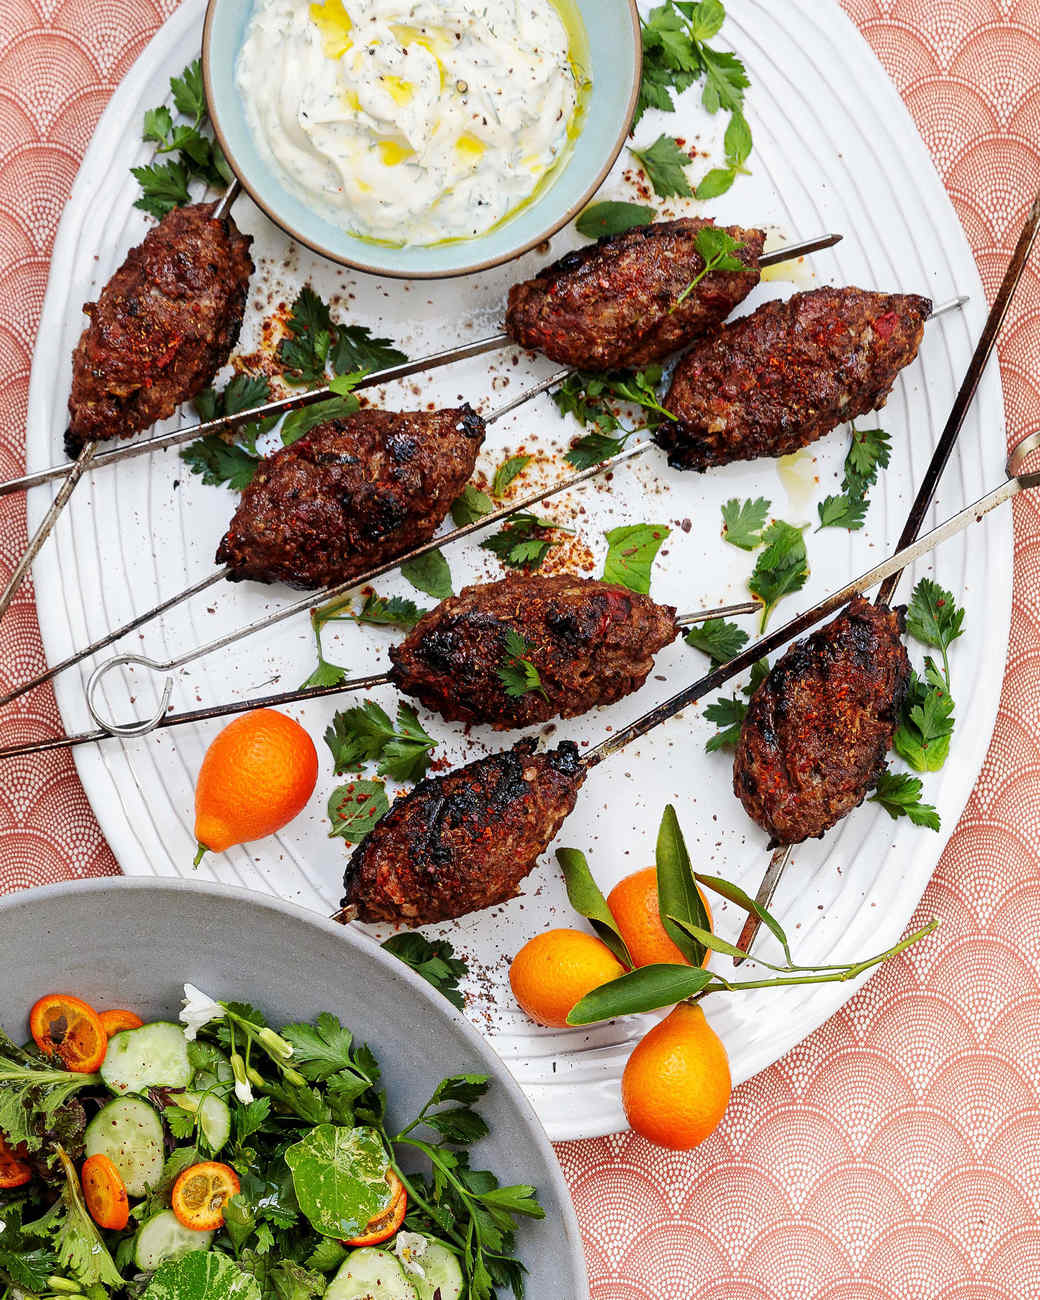 spiced lamb kebabs with herbed yogurt